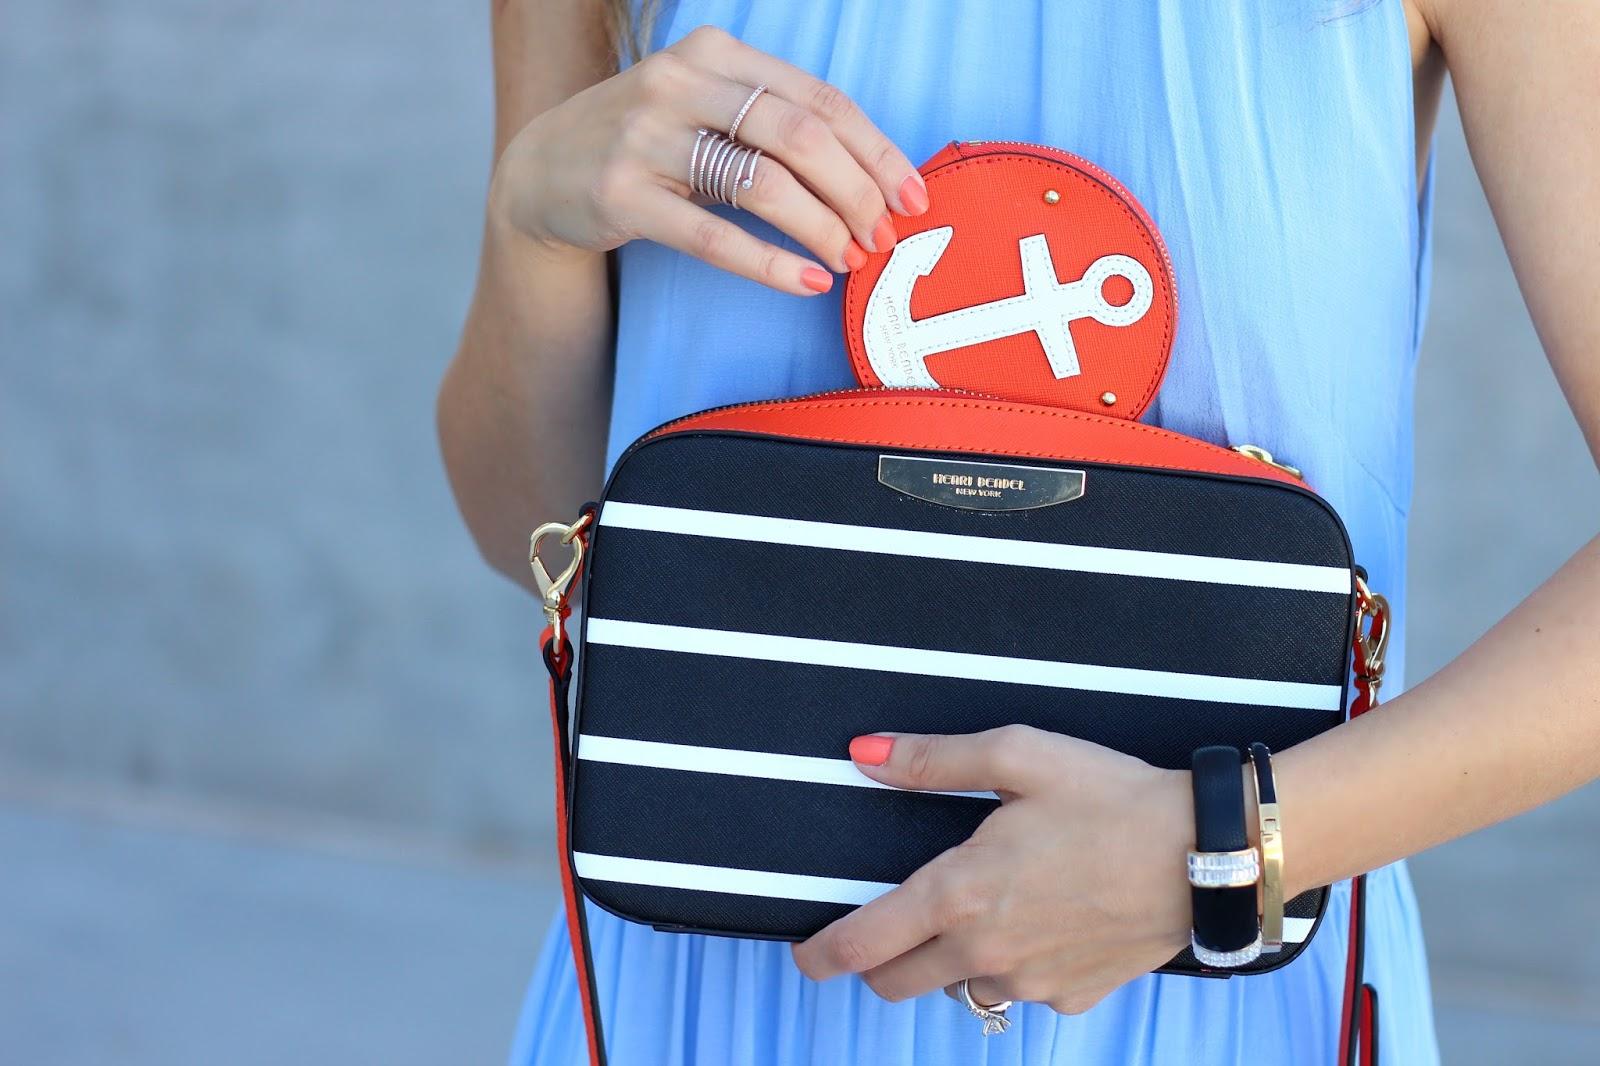 stripes, coin purse, henri bendel